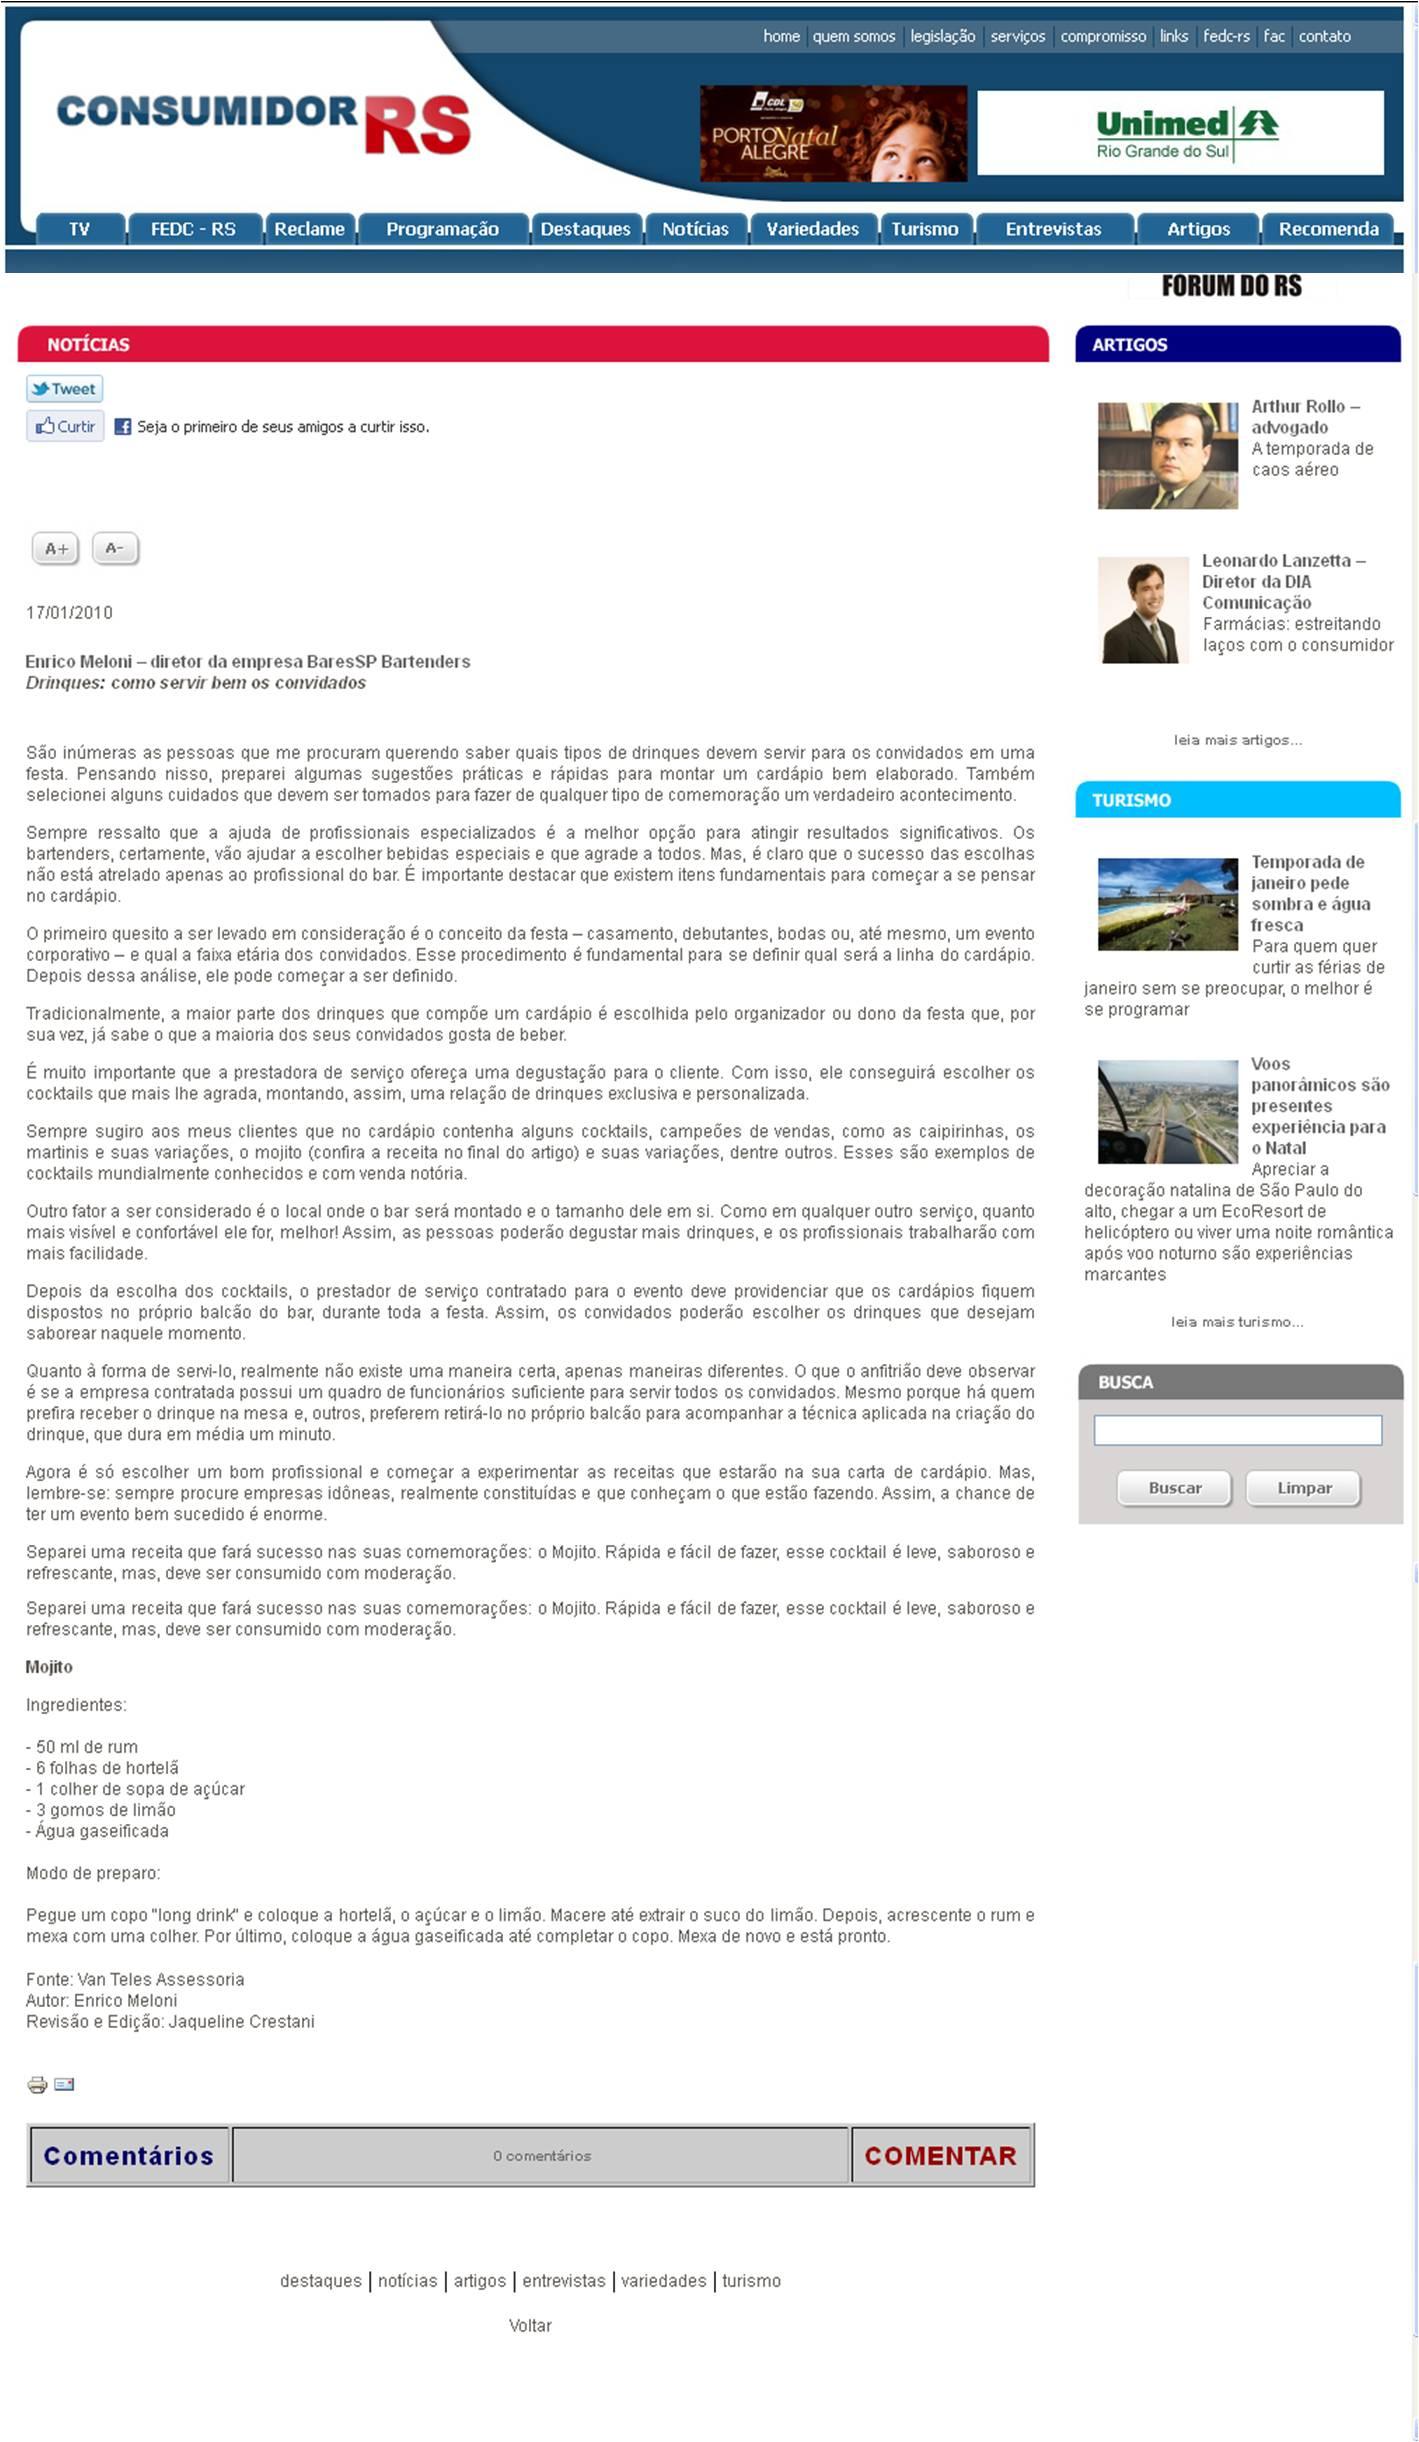 Matéria no Portal Consumidor RS